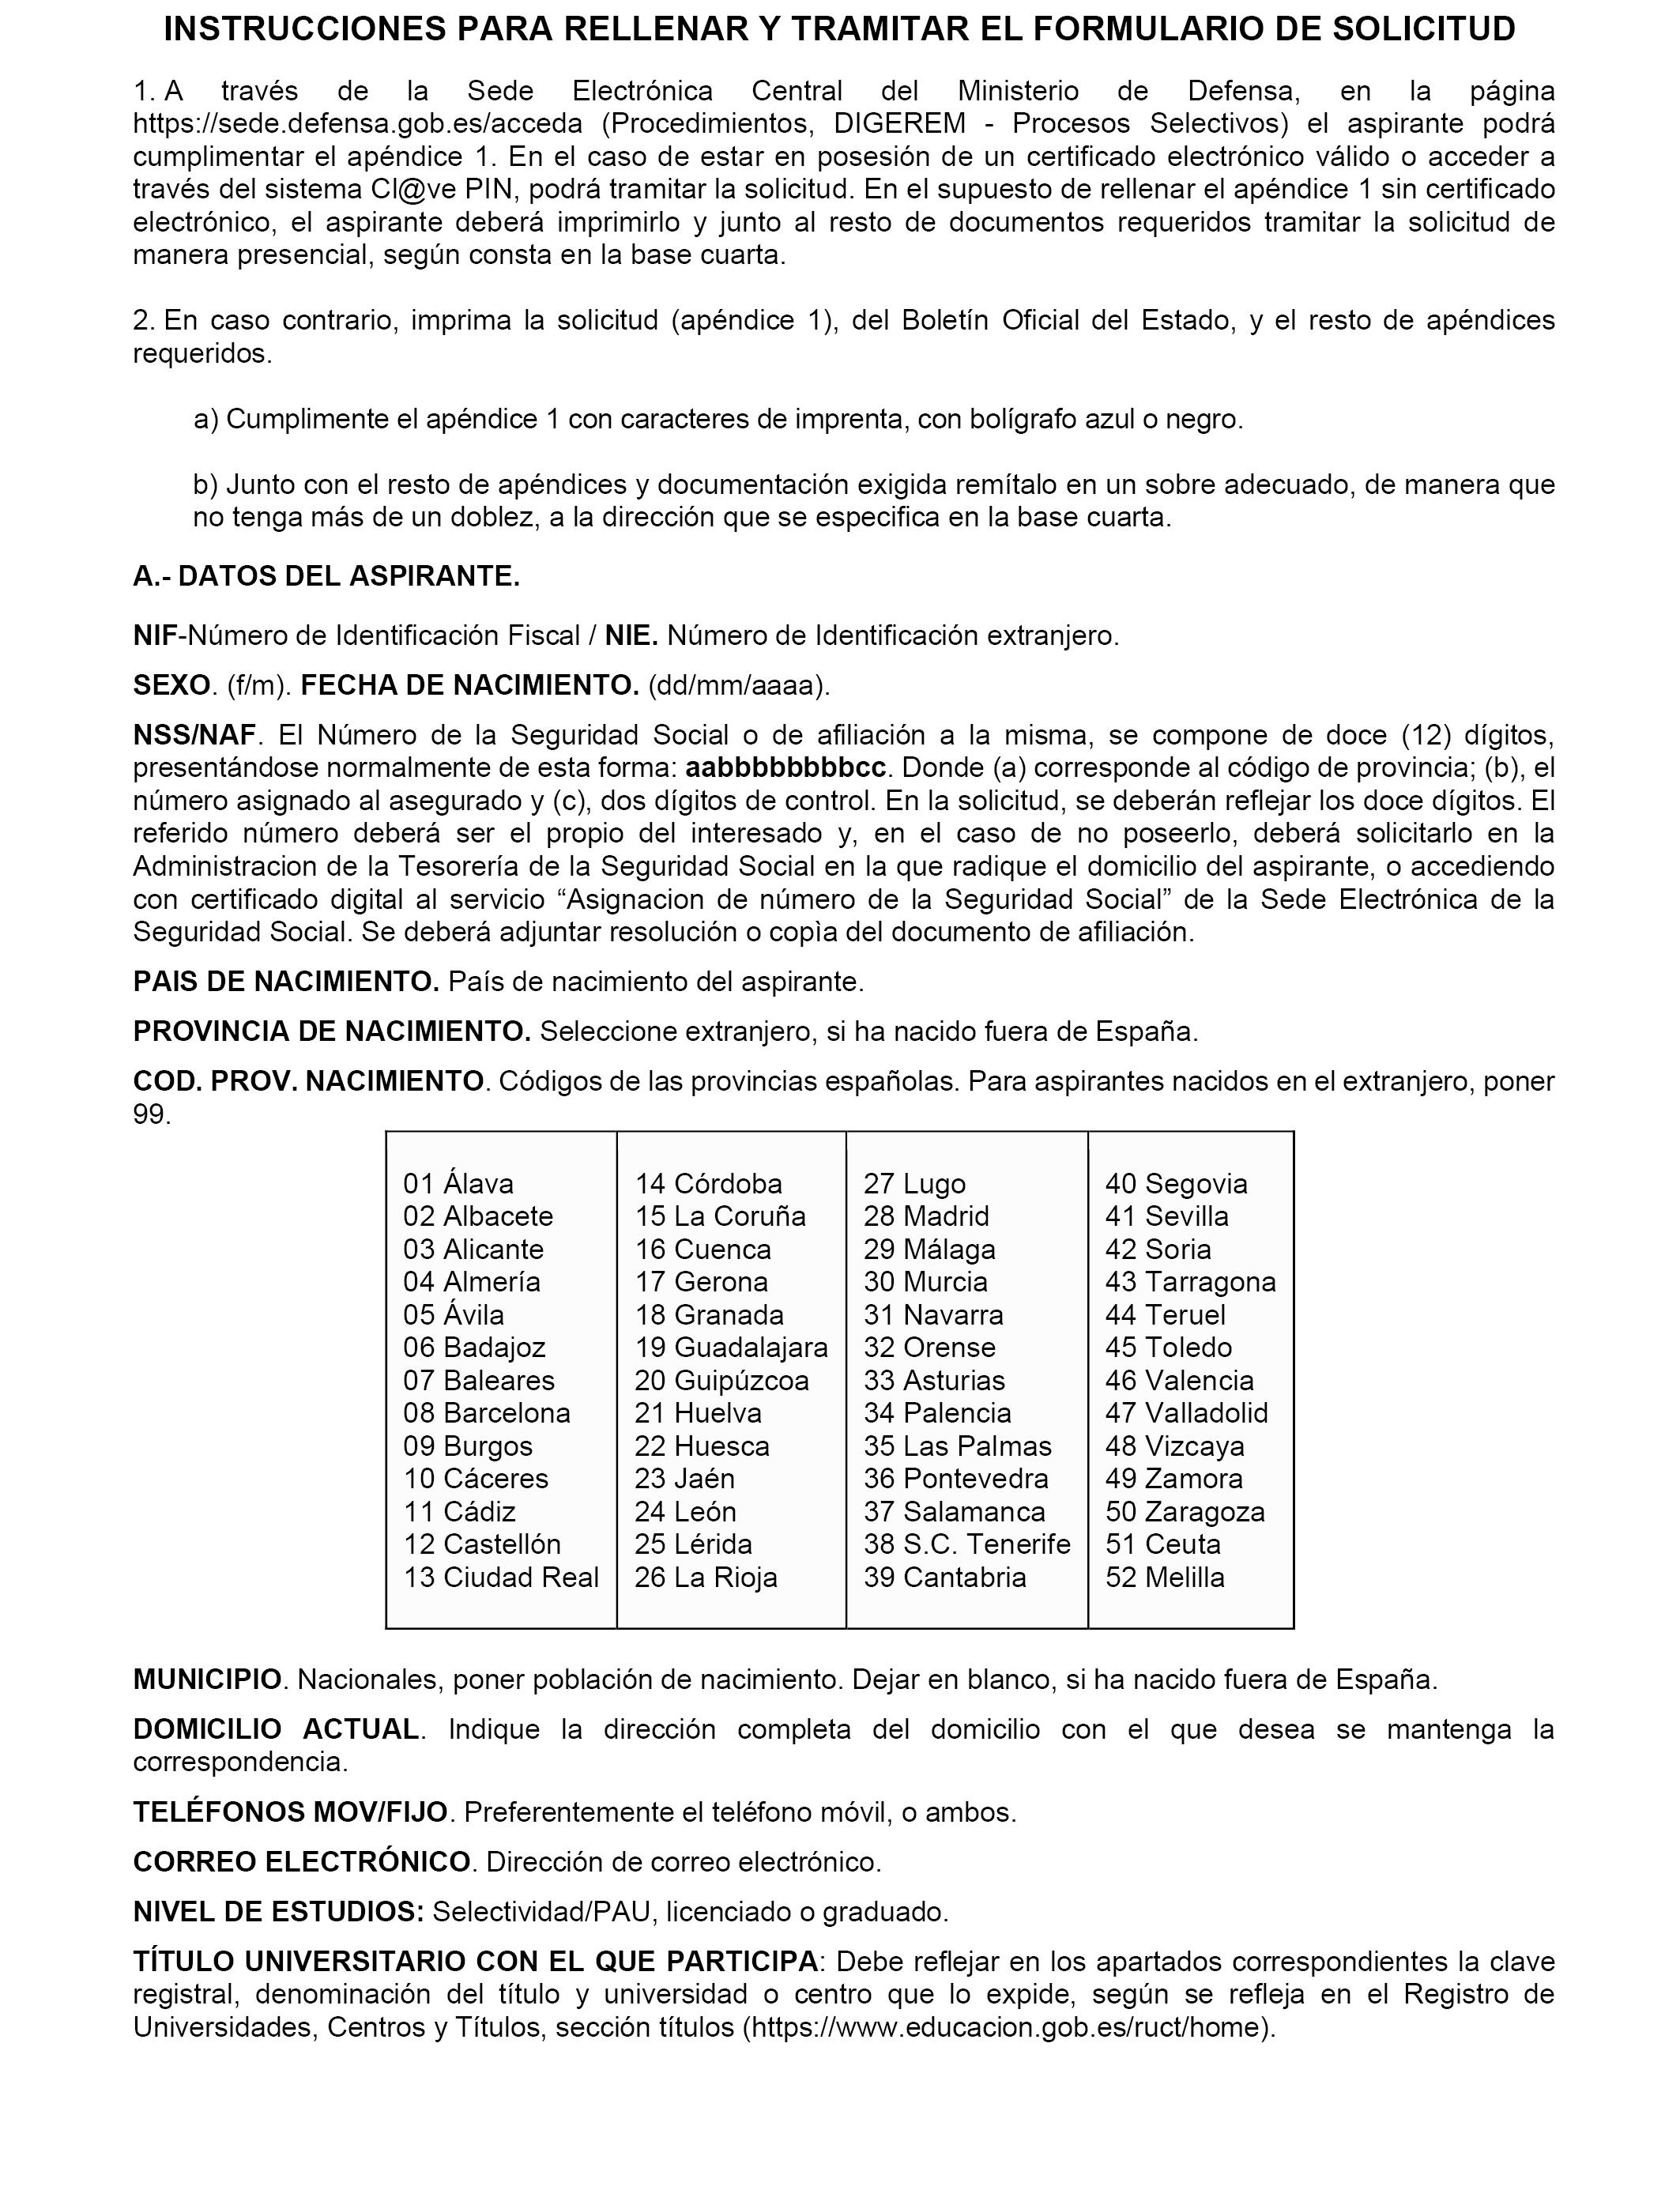 BOE.es - Documento BOE-A-2016-4868